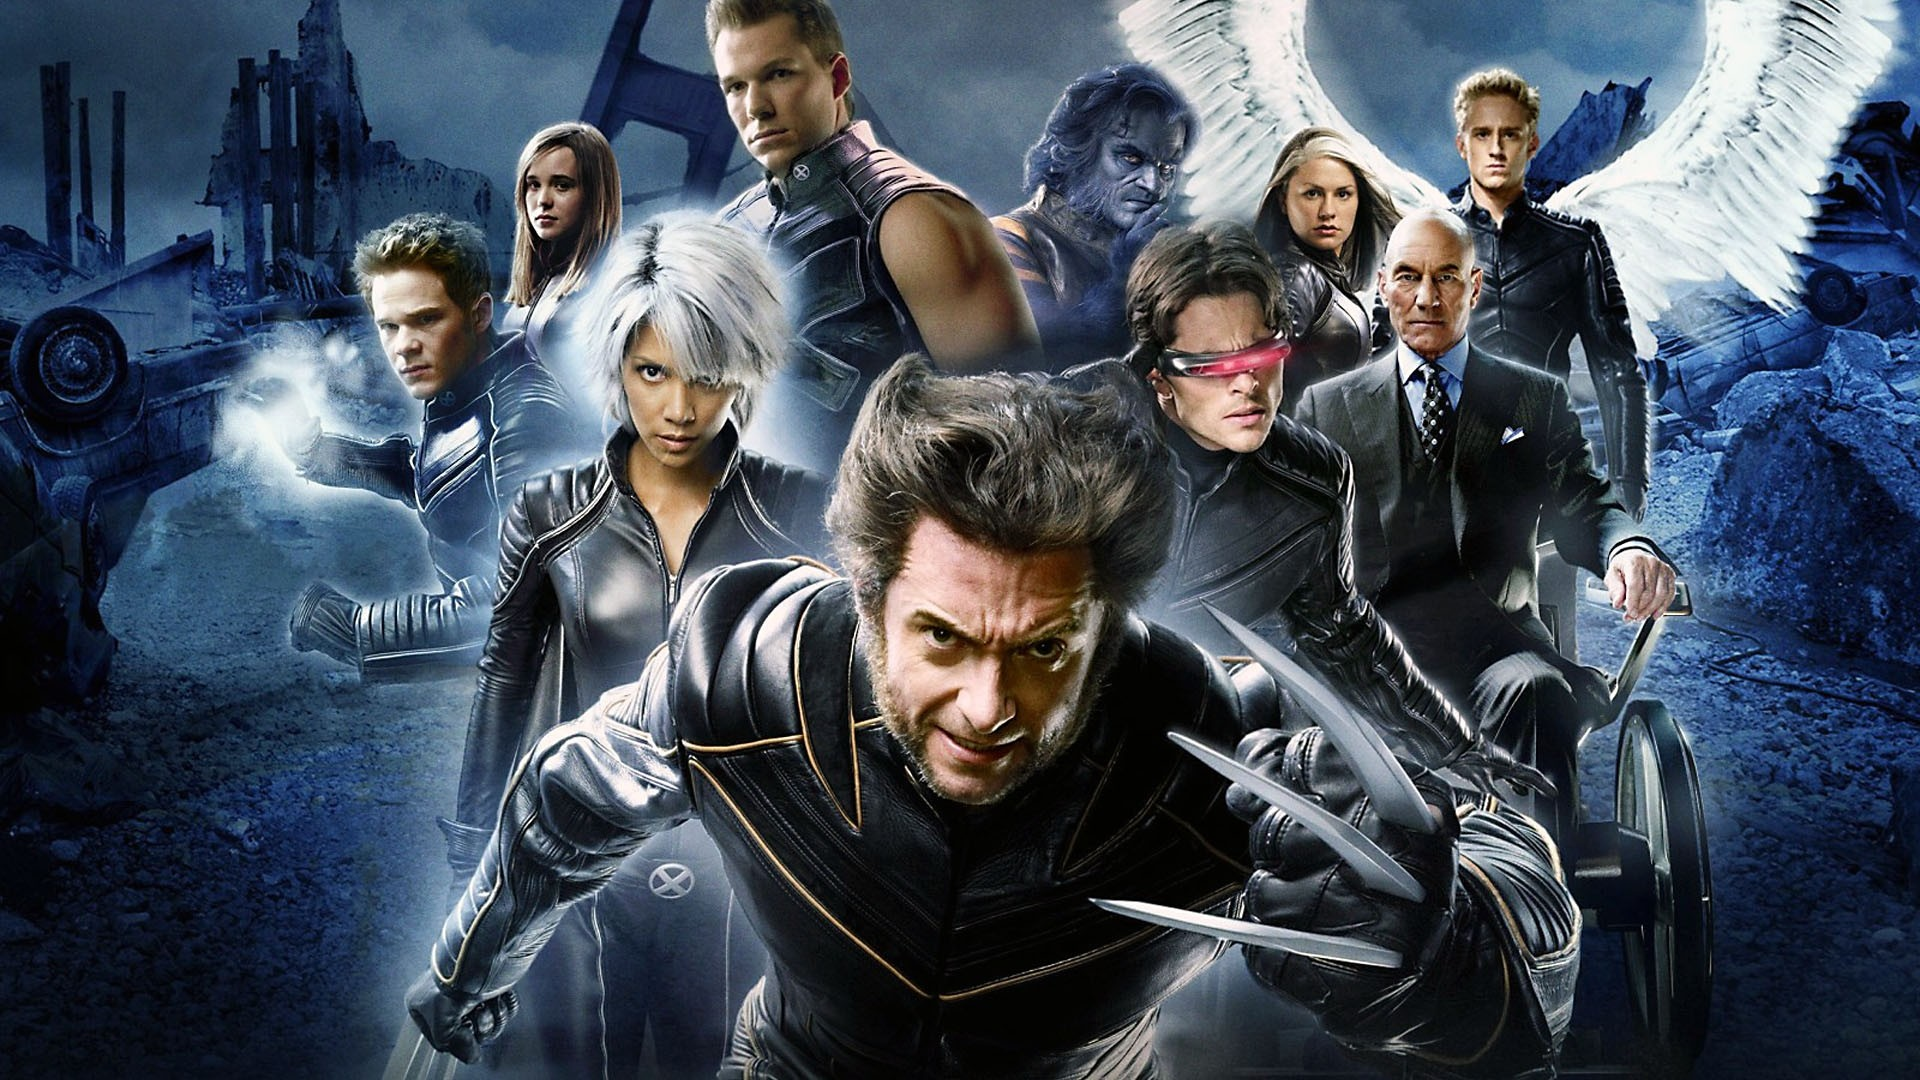 X Men Apocalypse Wallpaper Posted By Ethan Peltier